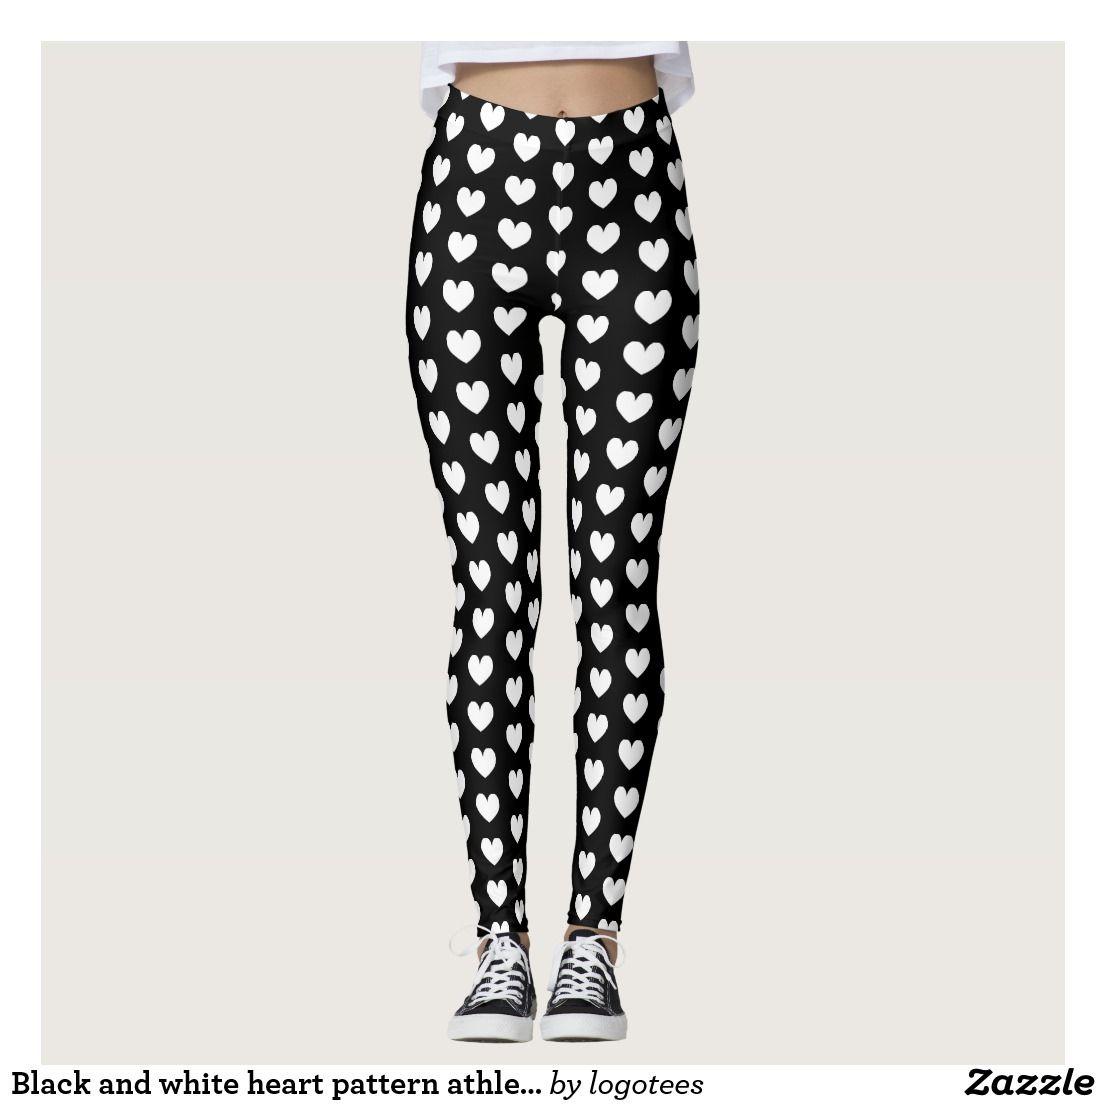 c73746d5da231 Black and white heart pattern athleisure leggings | Zazzle.com in ...